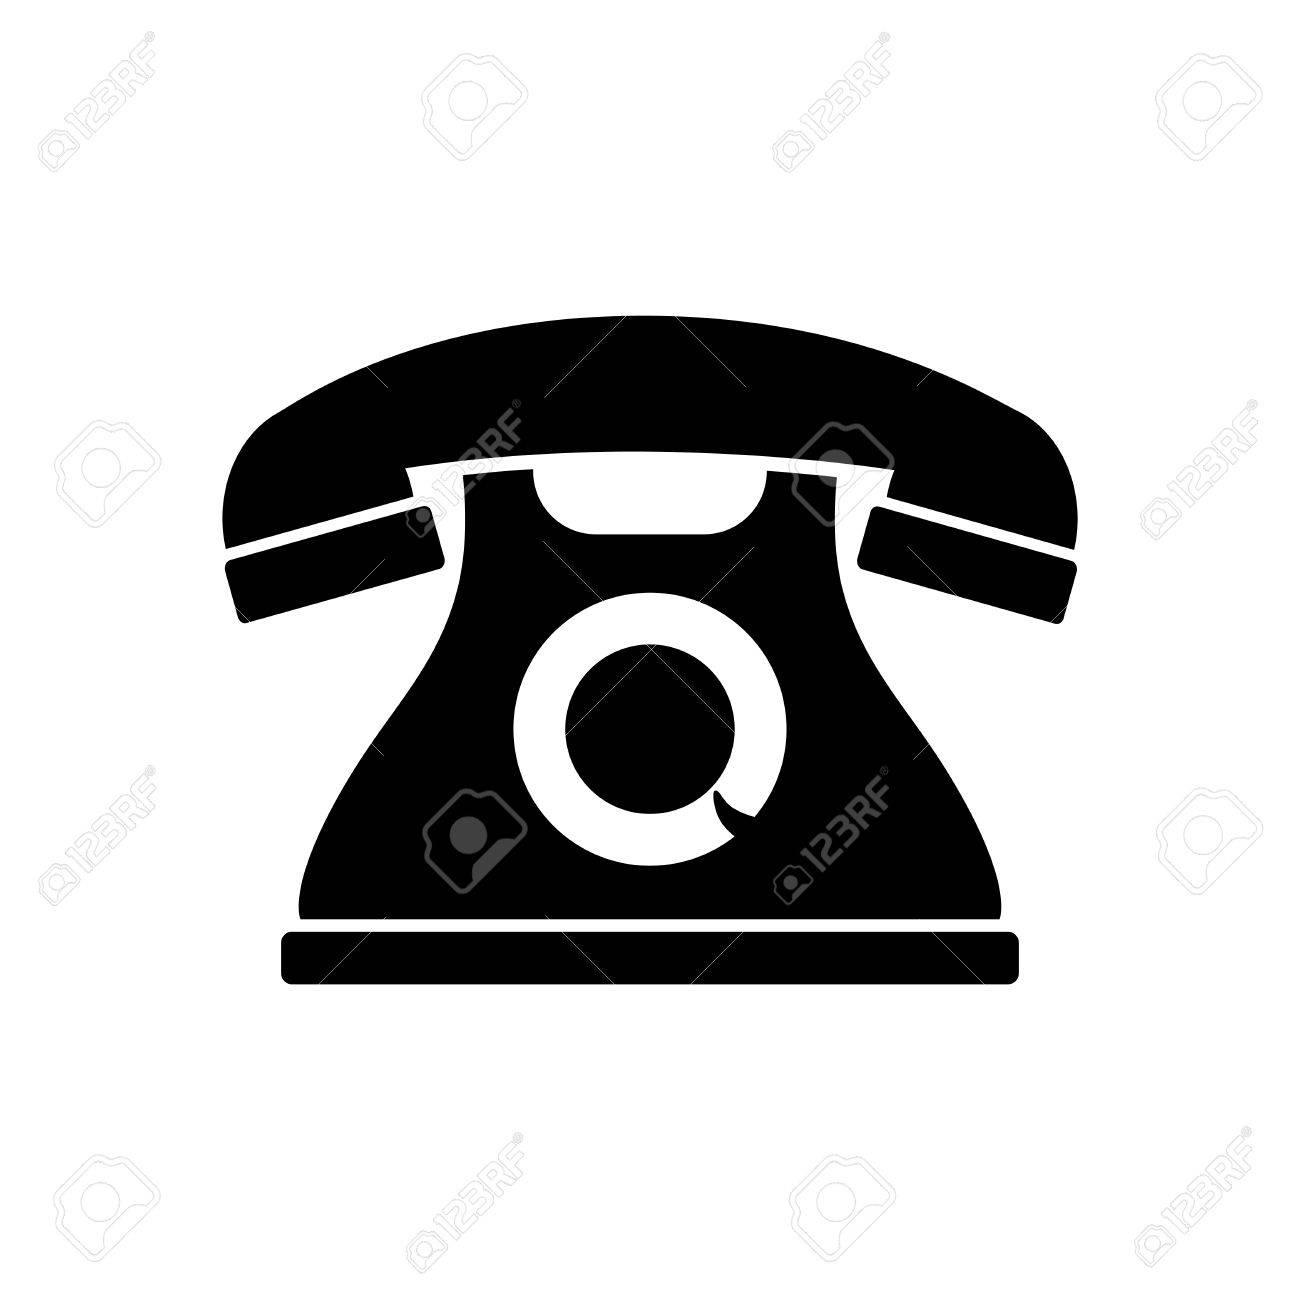 Black and white telephone icon.